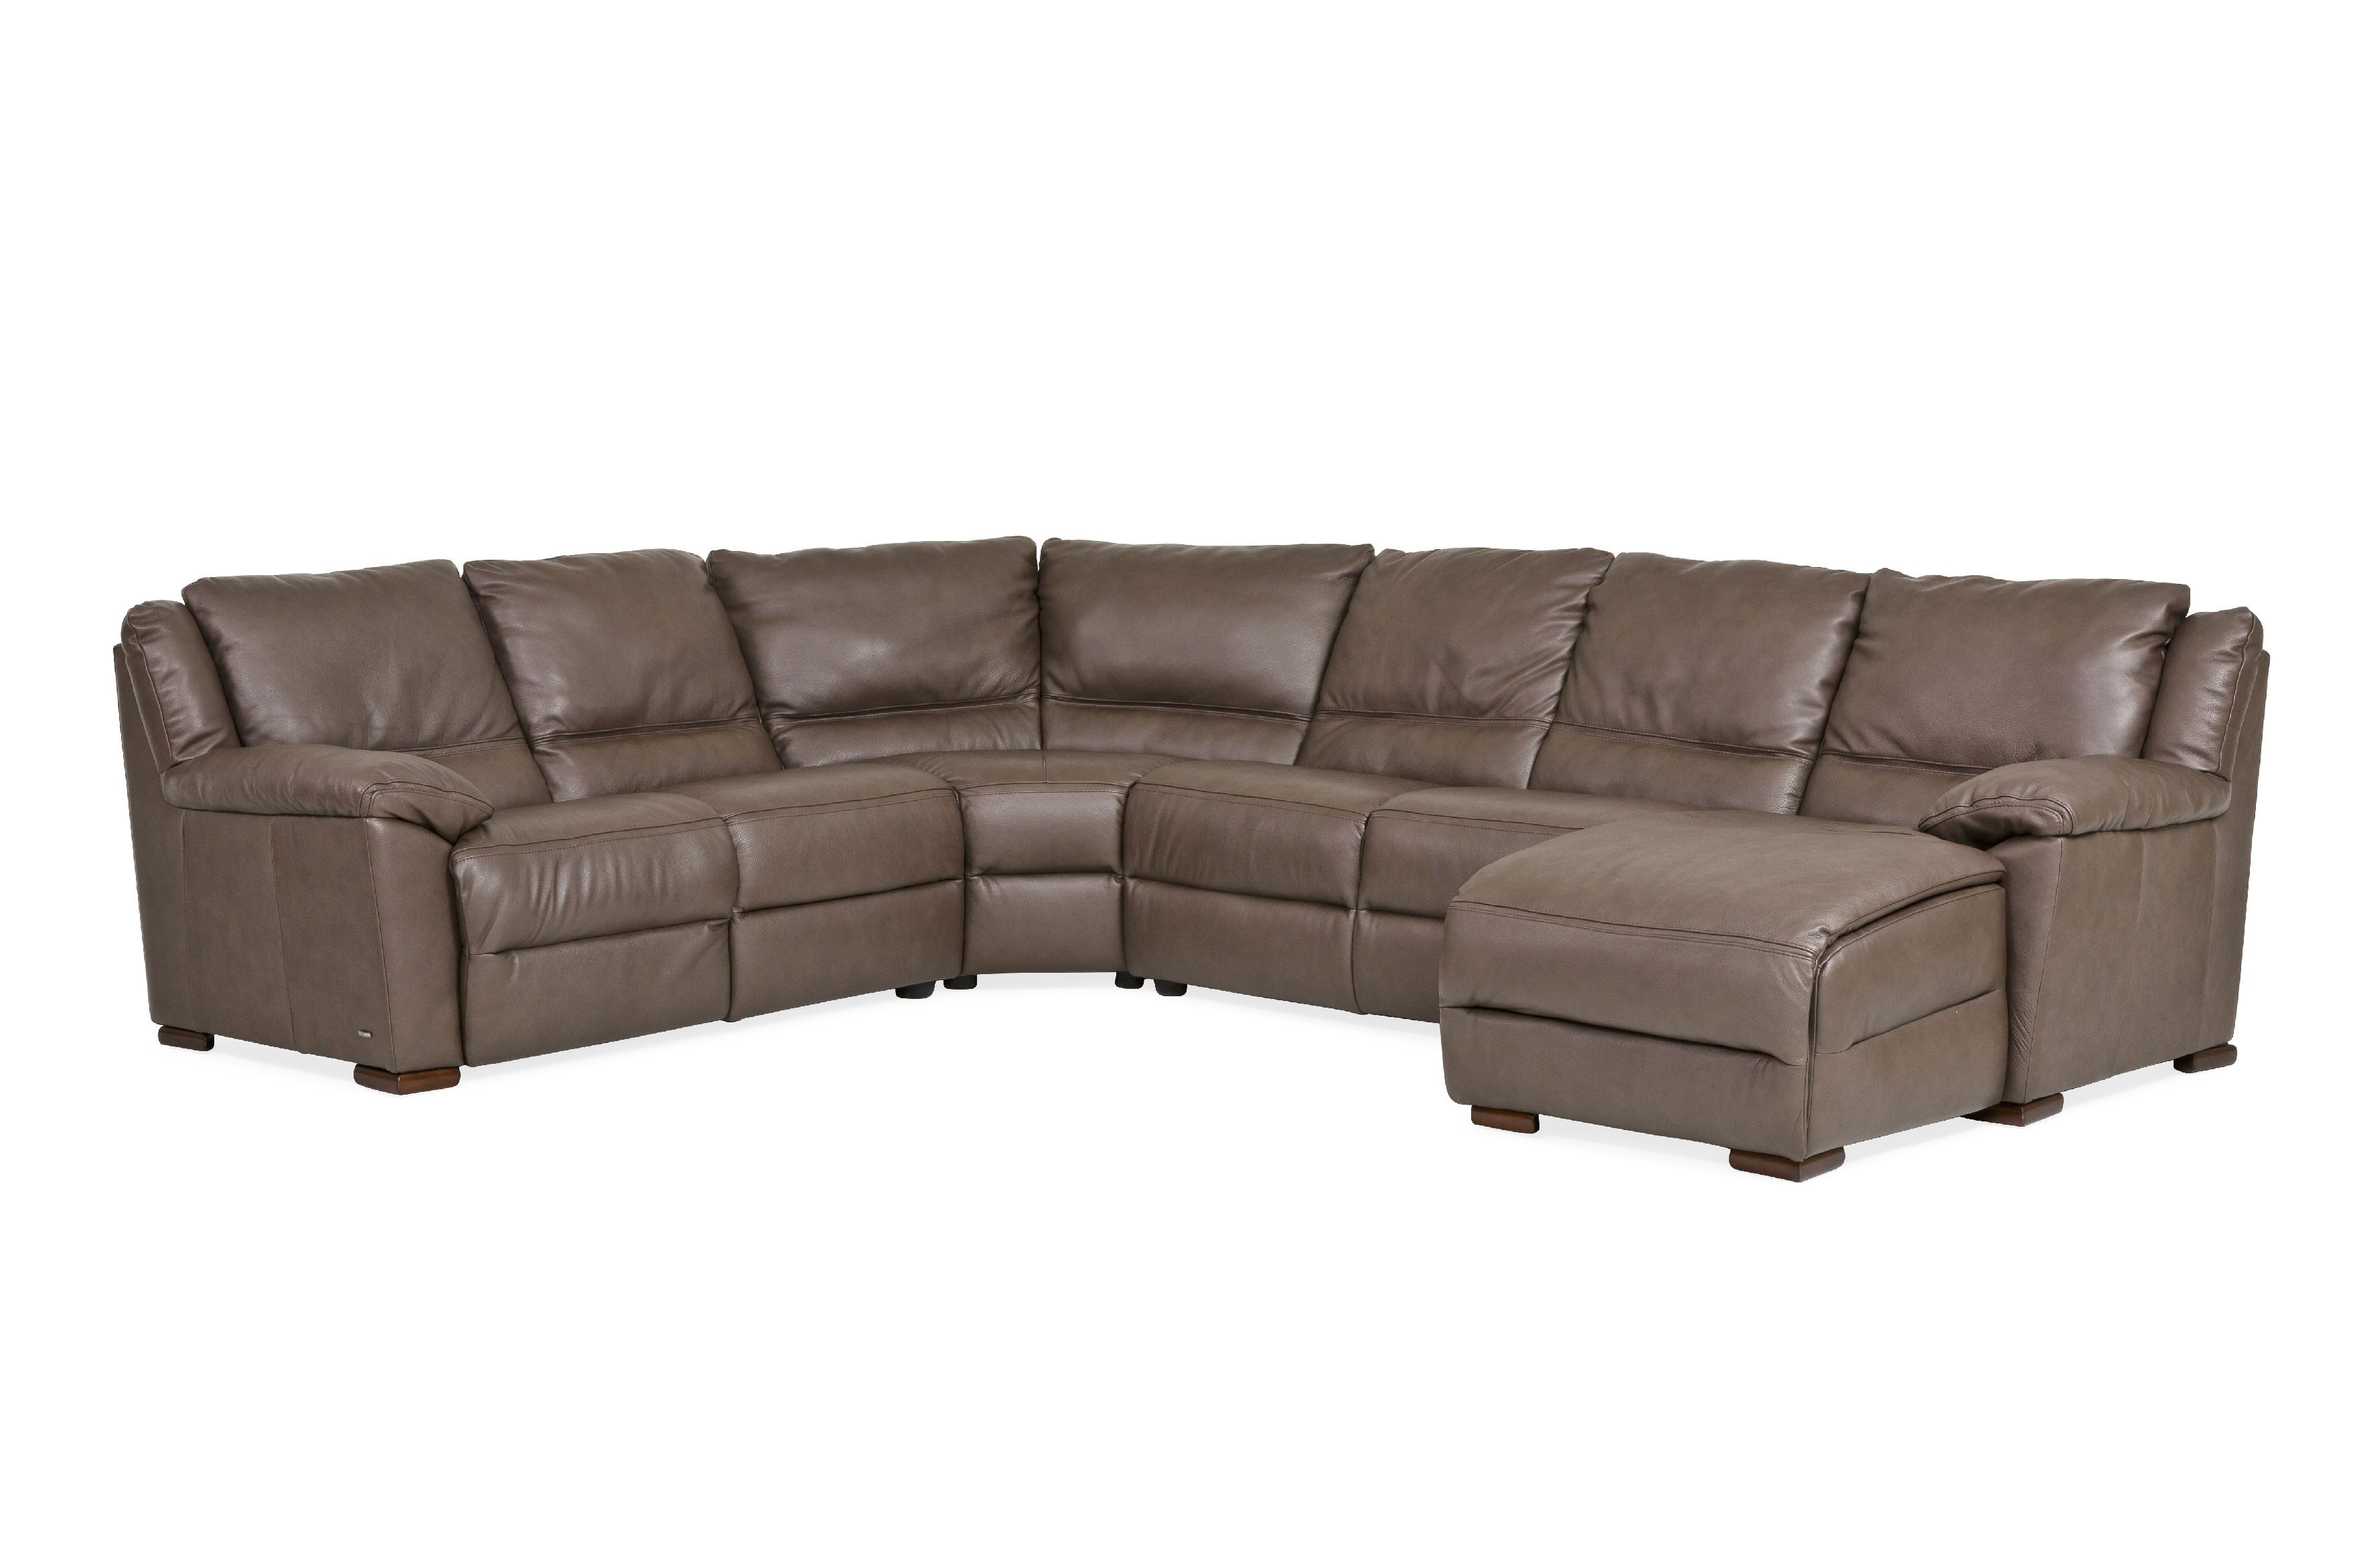 natuzzi lia fabric sleeper sofa reviews henredon tufted leather beautiful sectional sofas